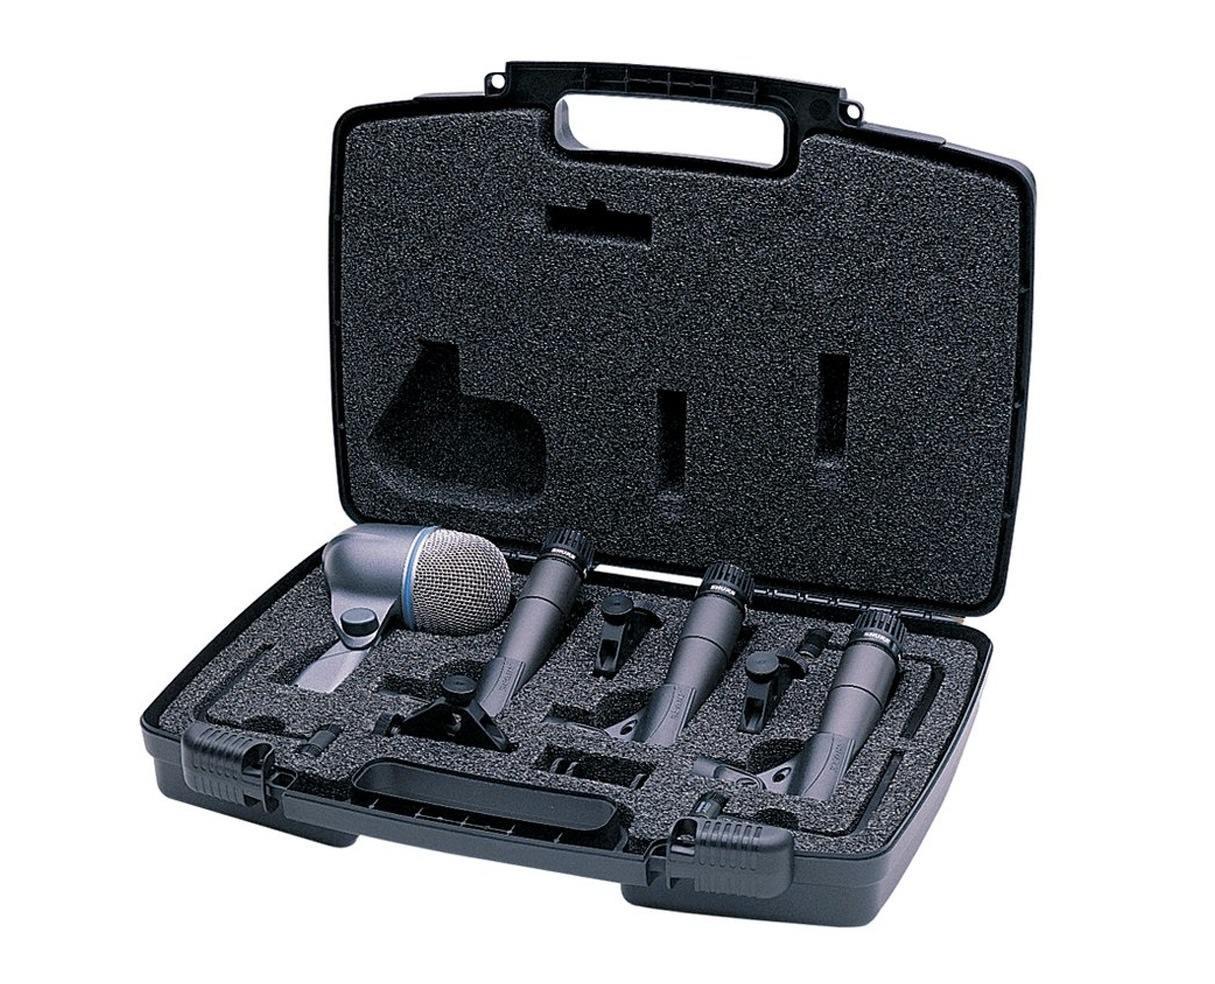 DMK57-52 - In Case